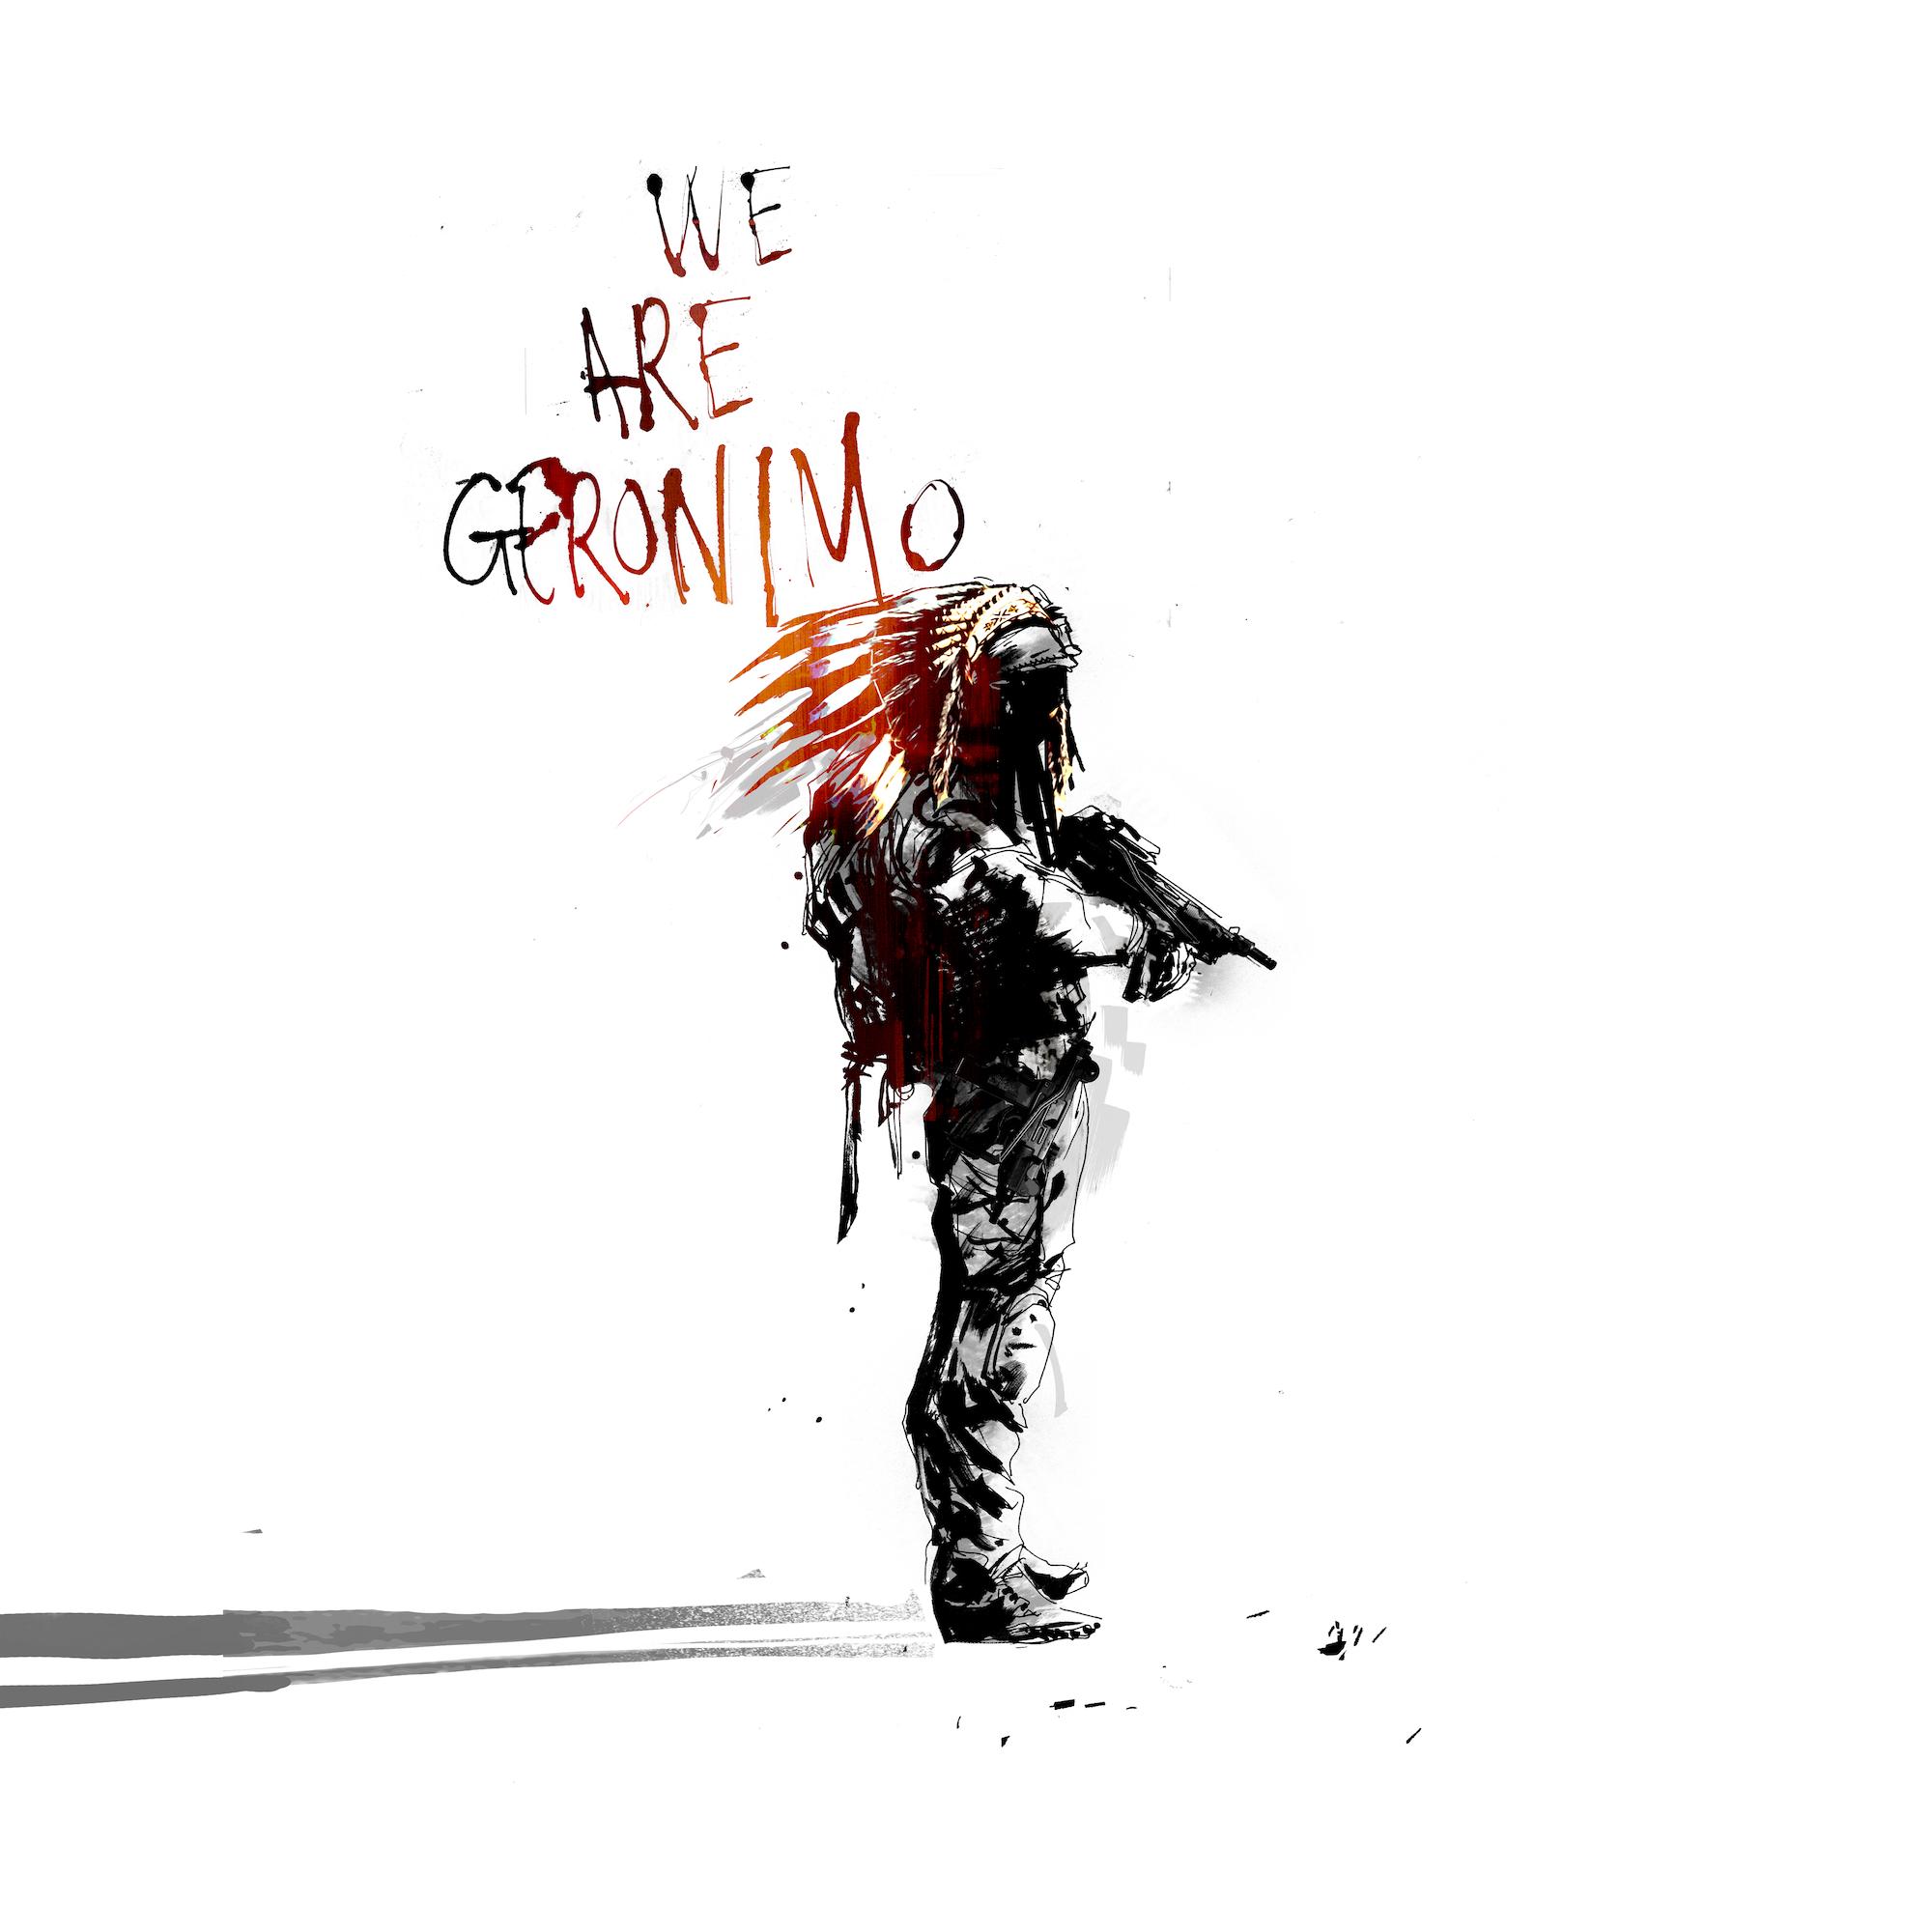 Colony: Geronimo Posters